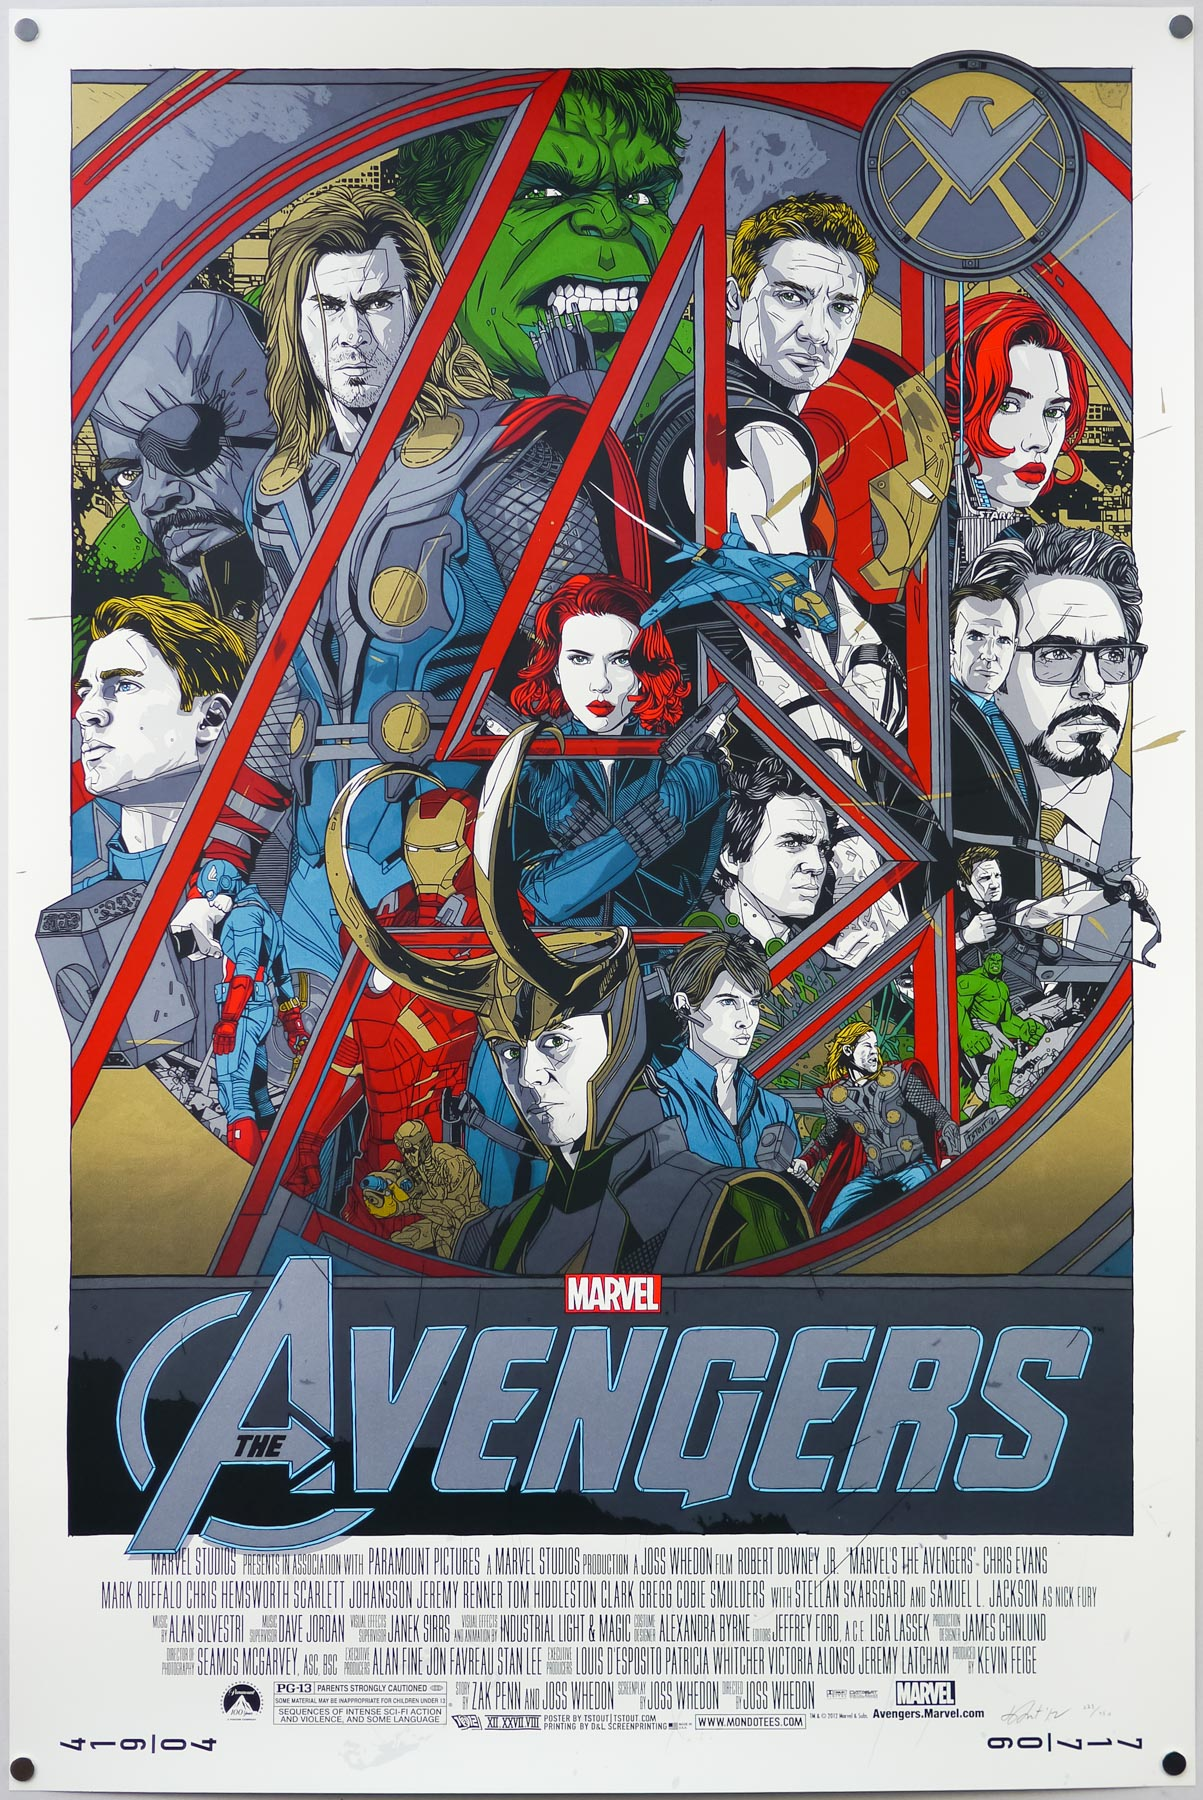 The regular version of Tyler Stout's screen print for The Avengers, 2012